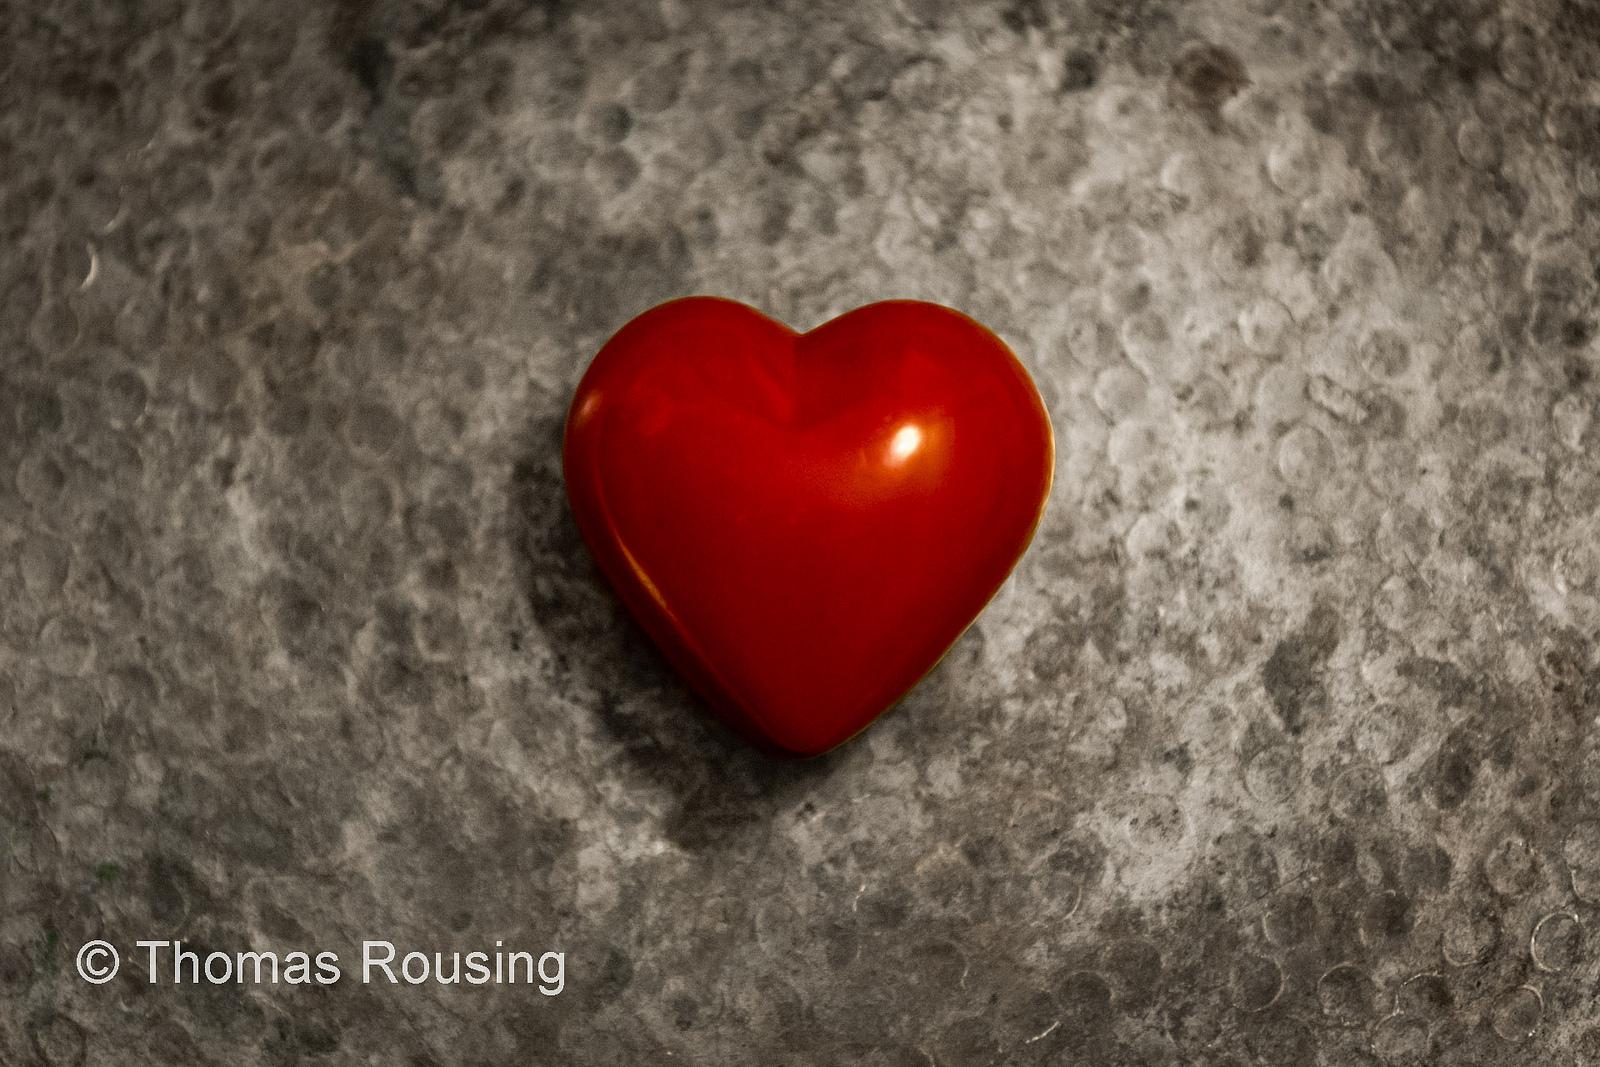 8.1 Heart on silver platter –Thomas Rousing ©, Flickr